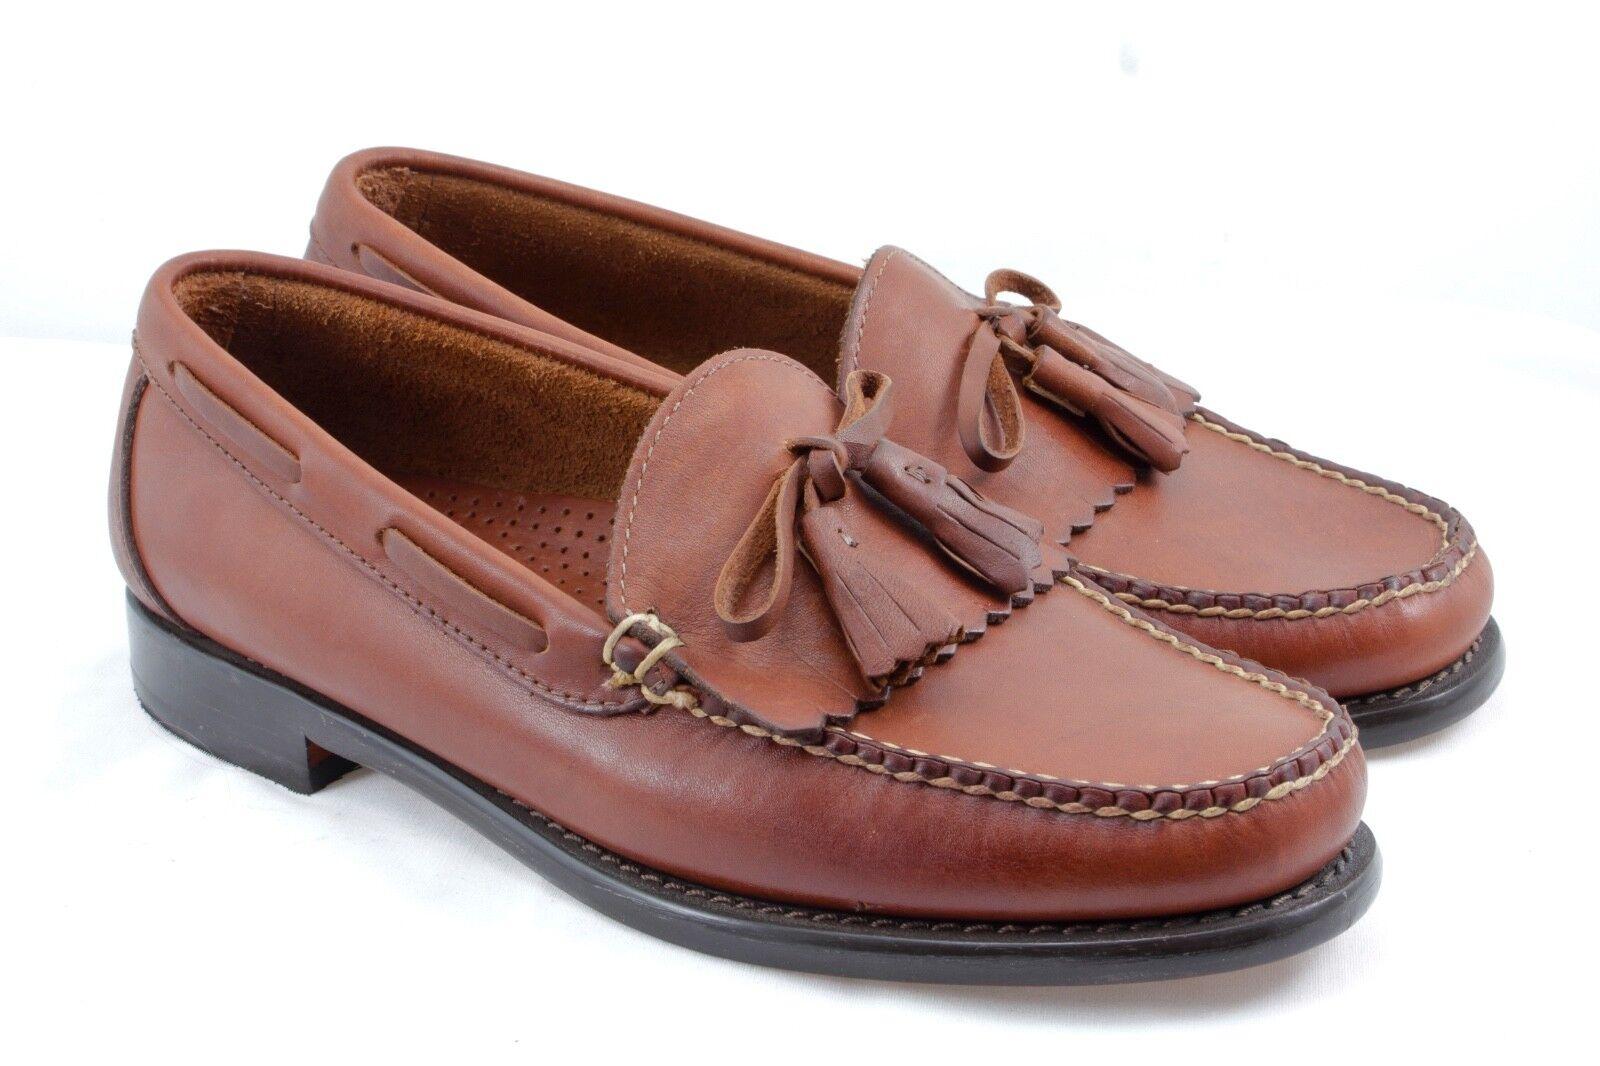 L.L. BEAN Handsewn Brown Pelle Kiltie Tassel Moccasin Loafer 7 D